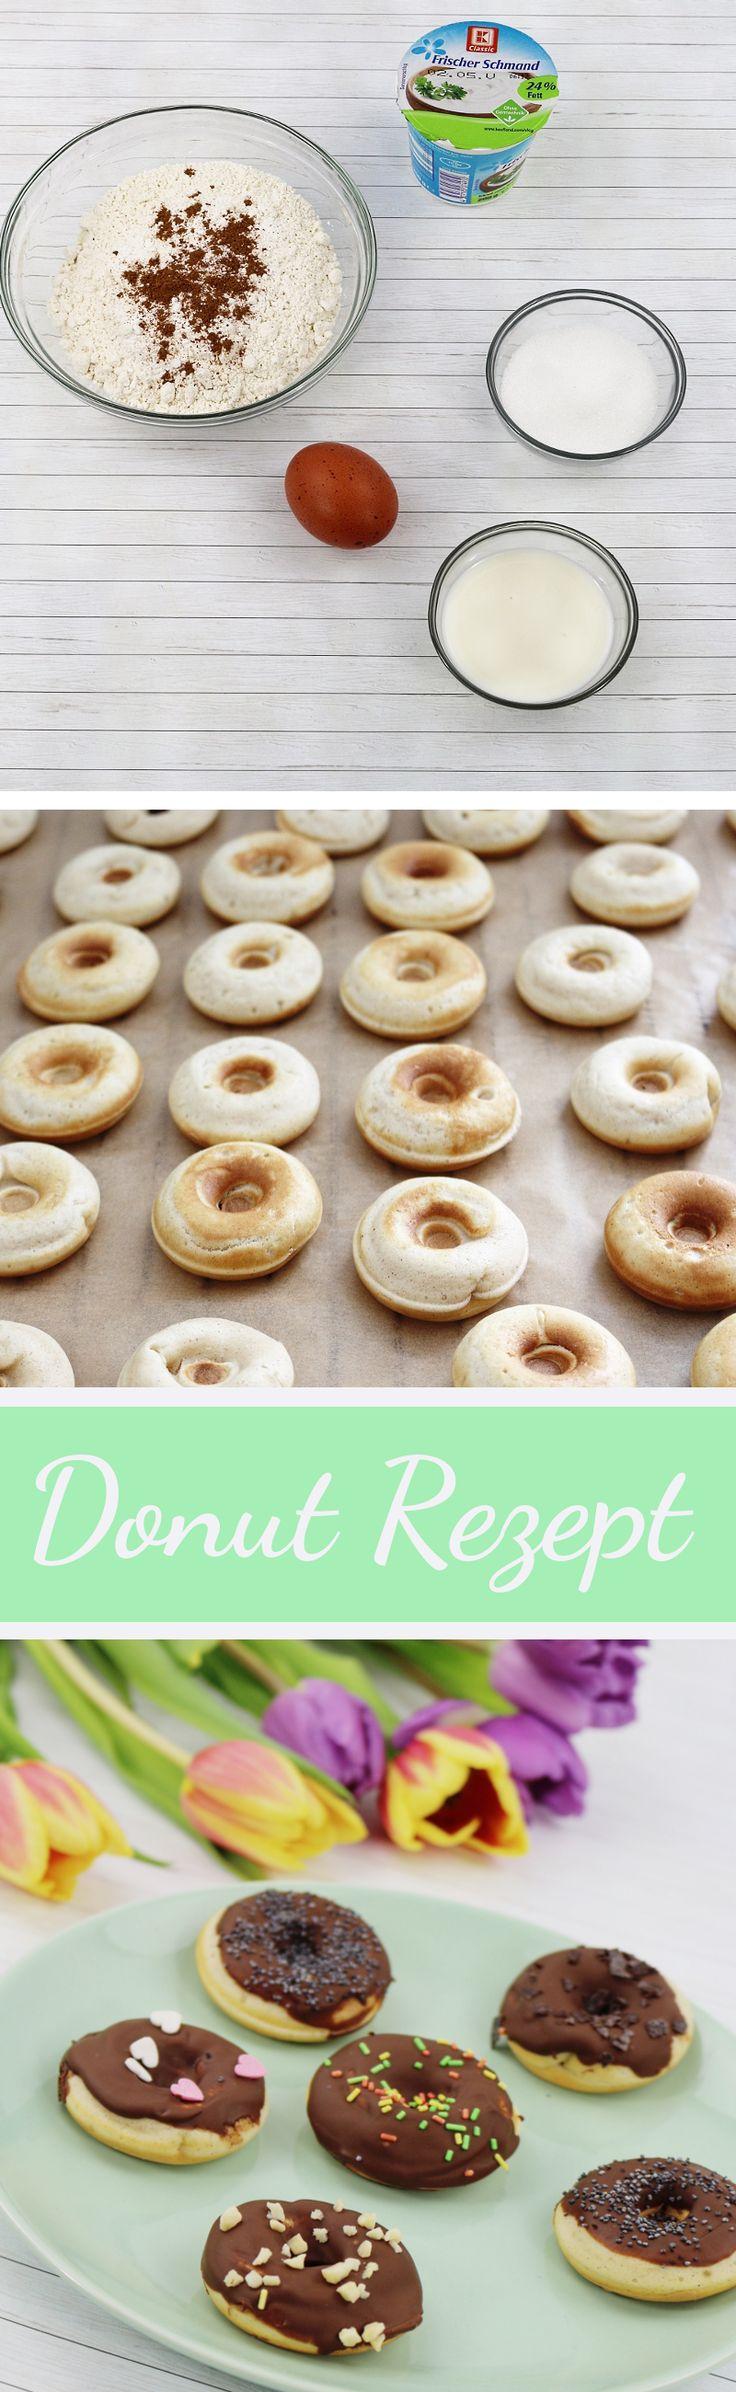 Donuts selber machen | Donut Rezept | Donuts aus dem Donut Maker | DIY Donuts